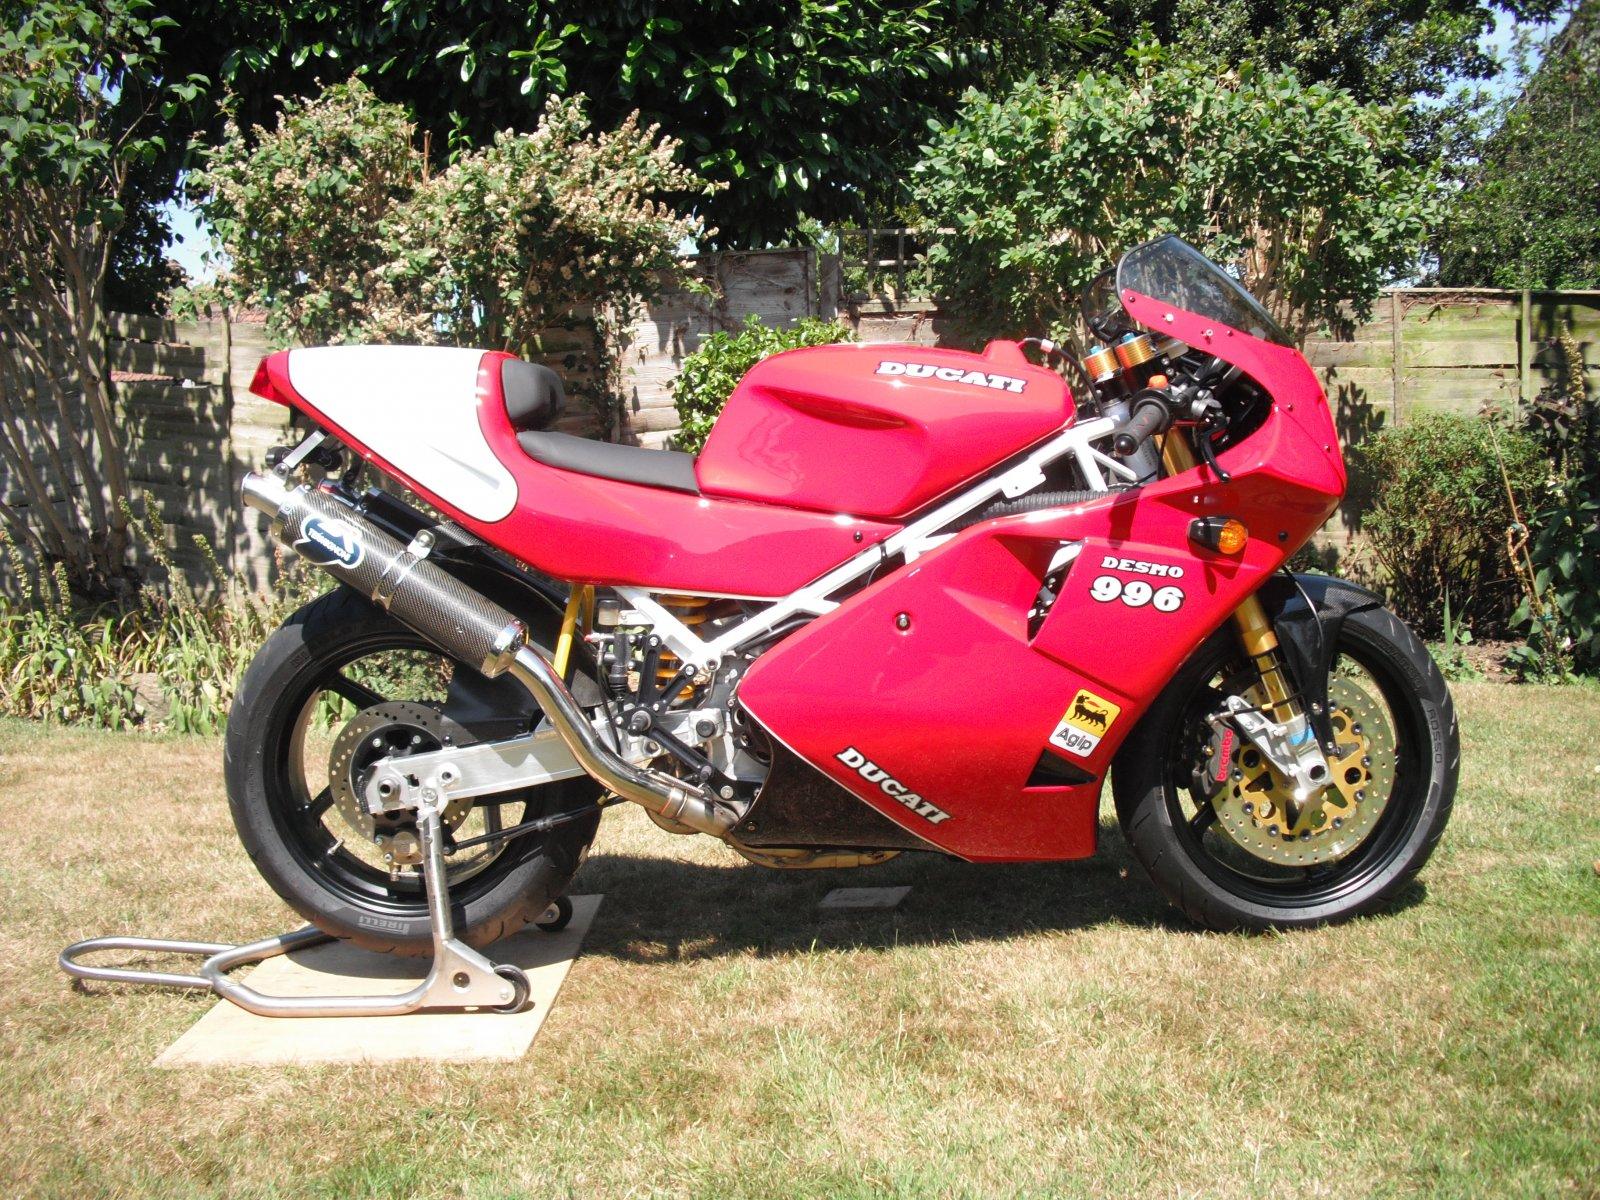 St4s New Immobiliser, Still No Start | Page 2 | Ducati Forum